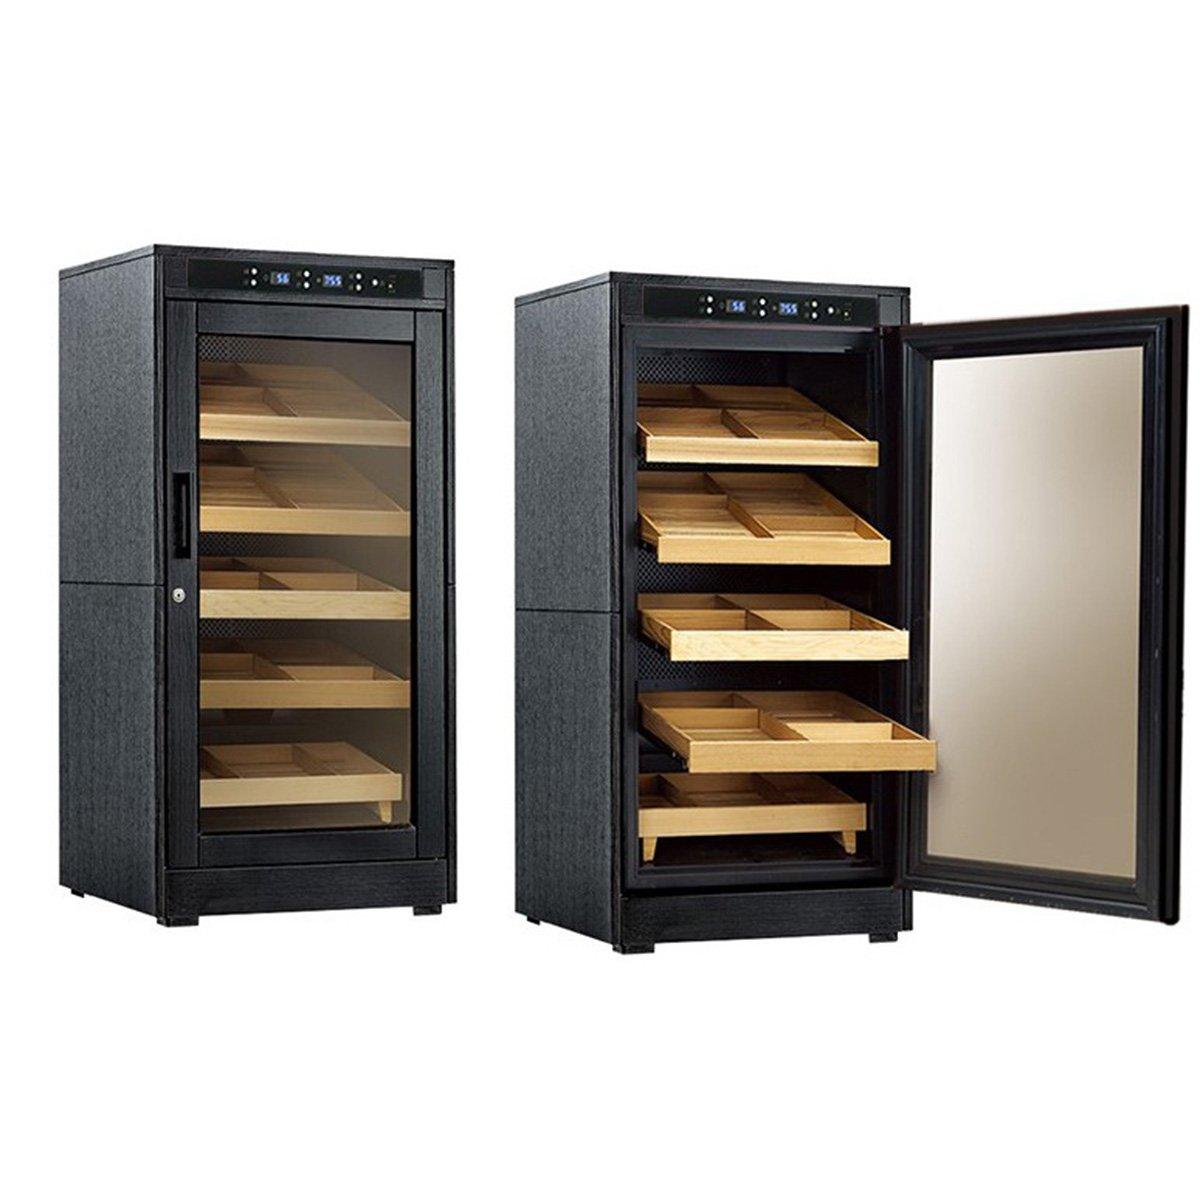 Prestige Import Group - The Redford Lite Cigar Cabinet Humidor - Capacity: 1250 - Color: Black Oak Finish